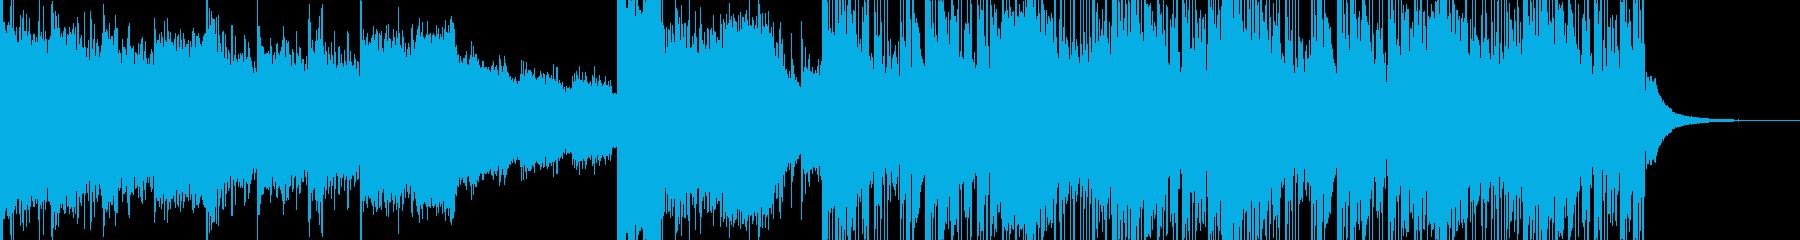 【CM】バトルシーン全般をショートに集約の再生済みの波形